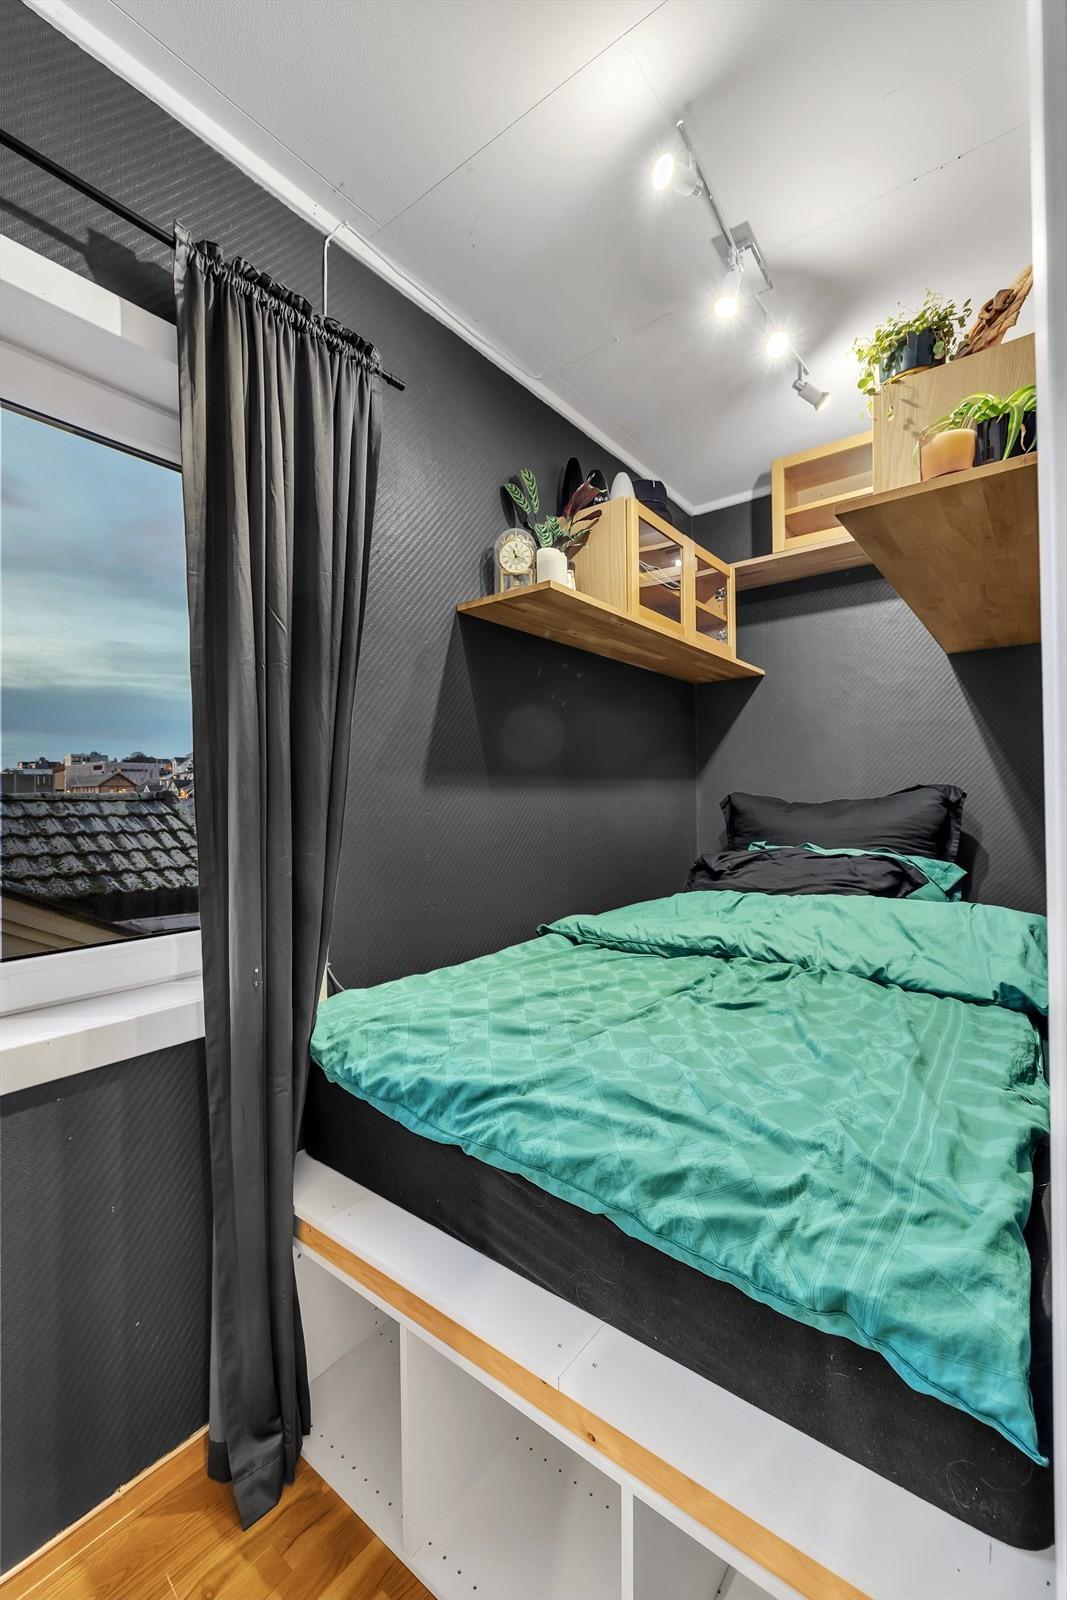 Sovealkove med lagring under sengen